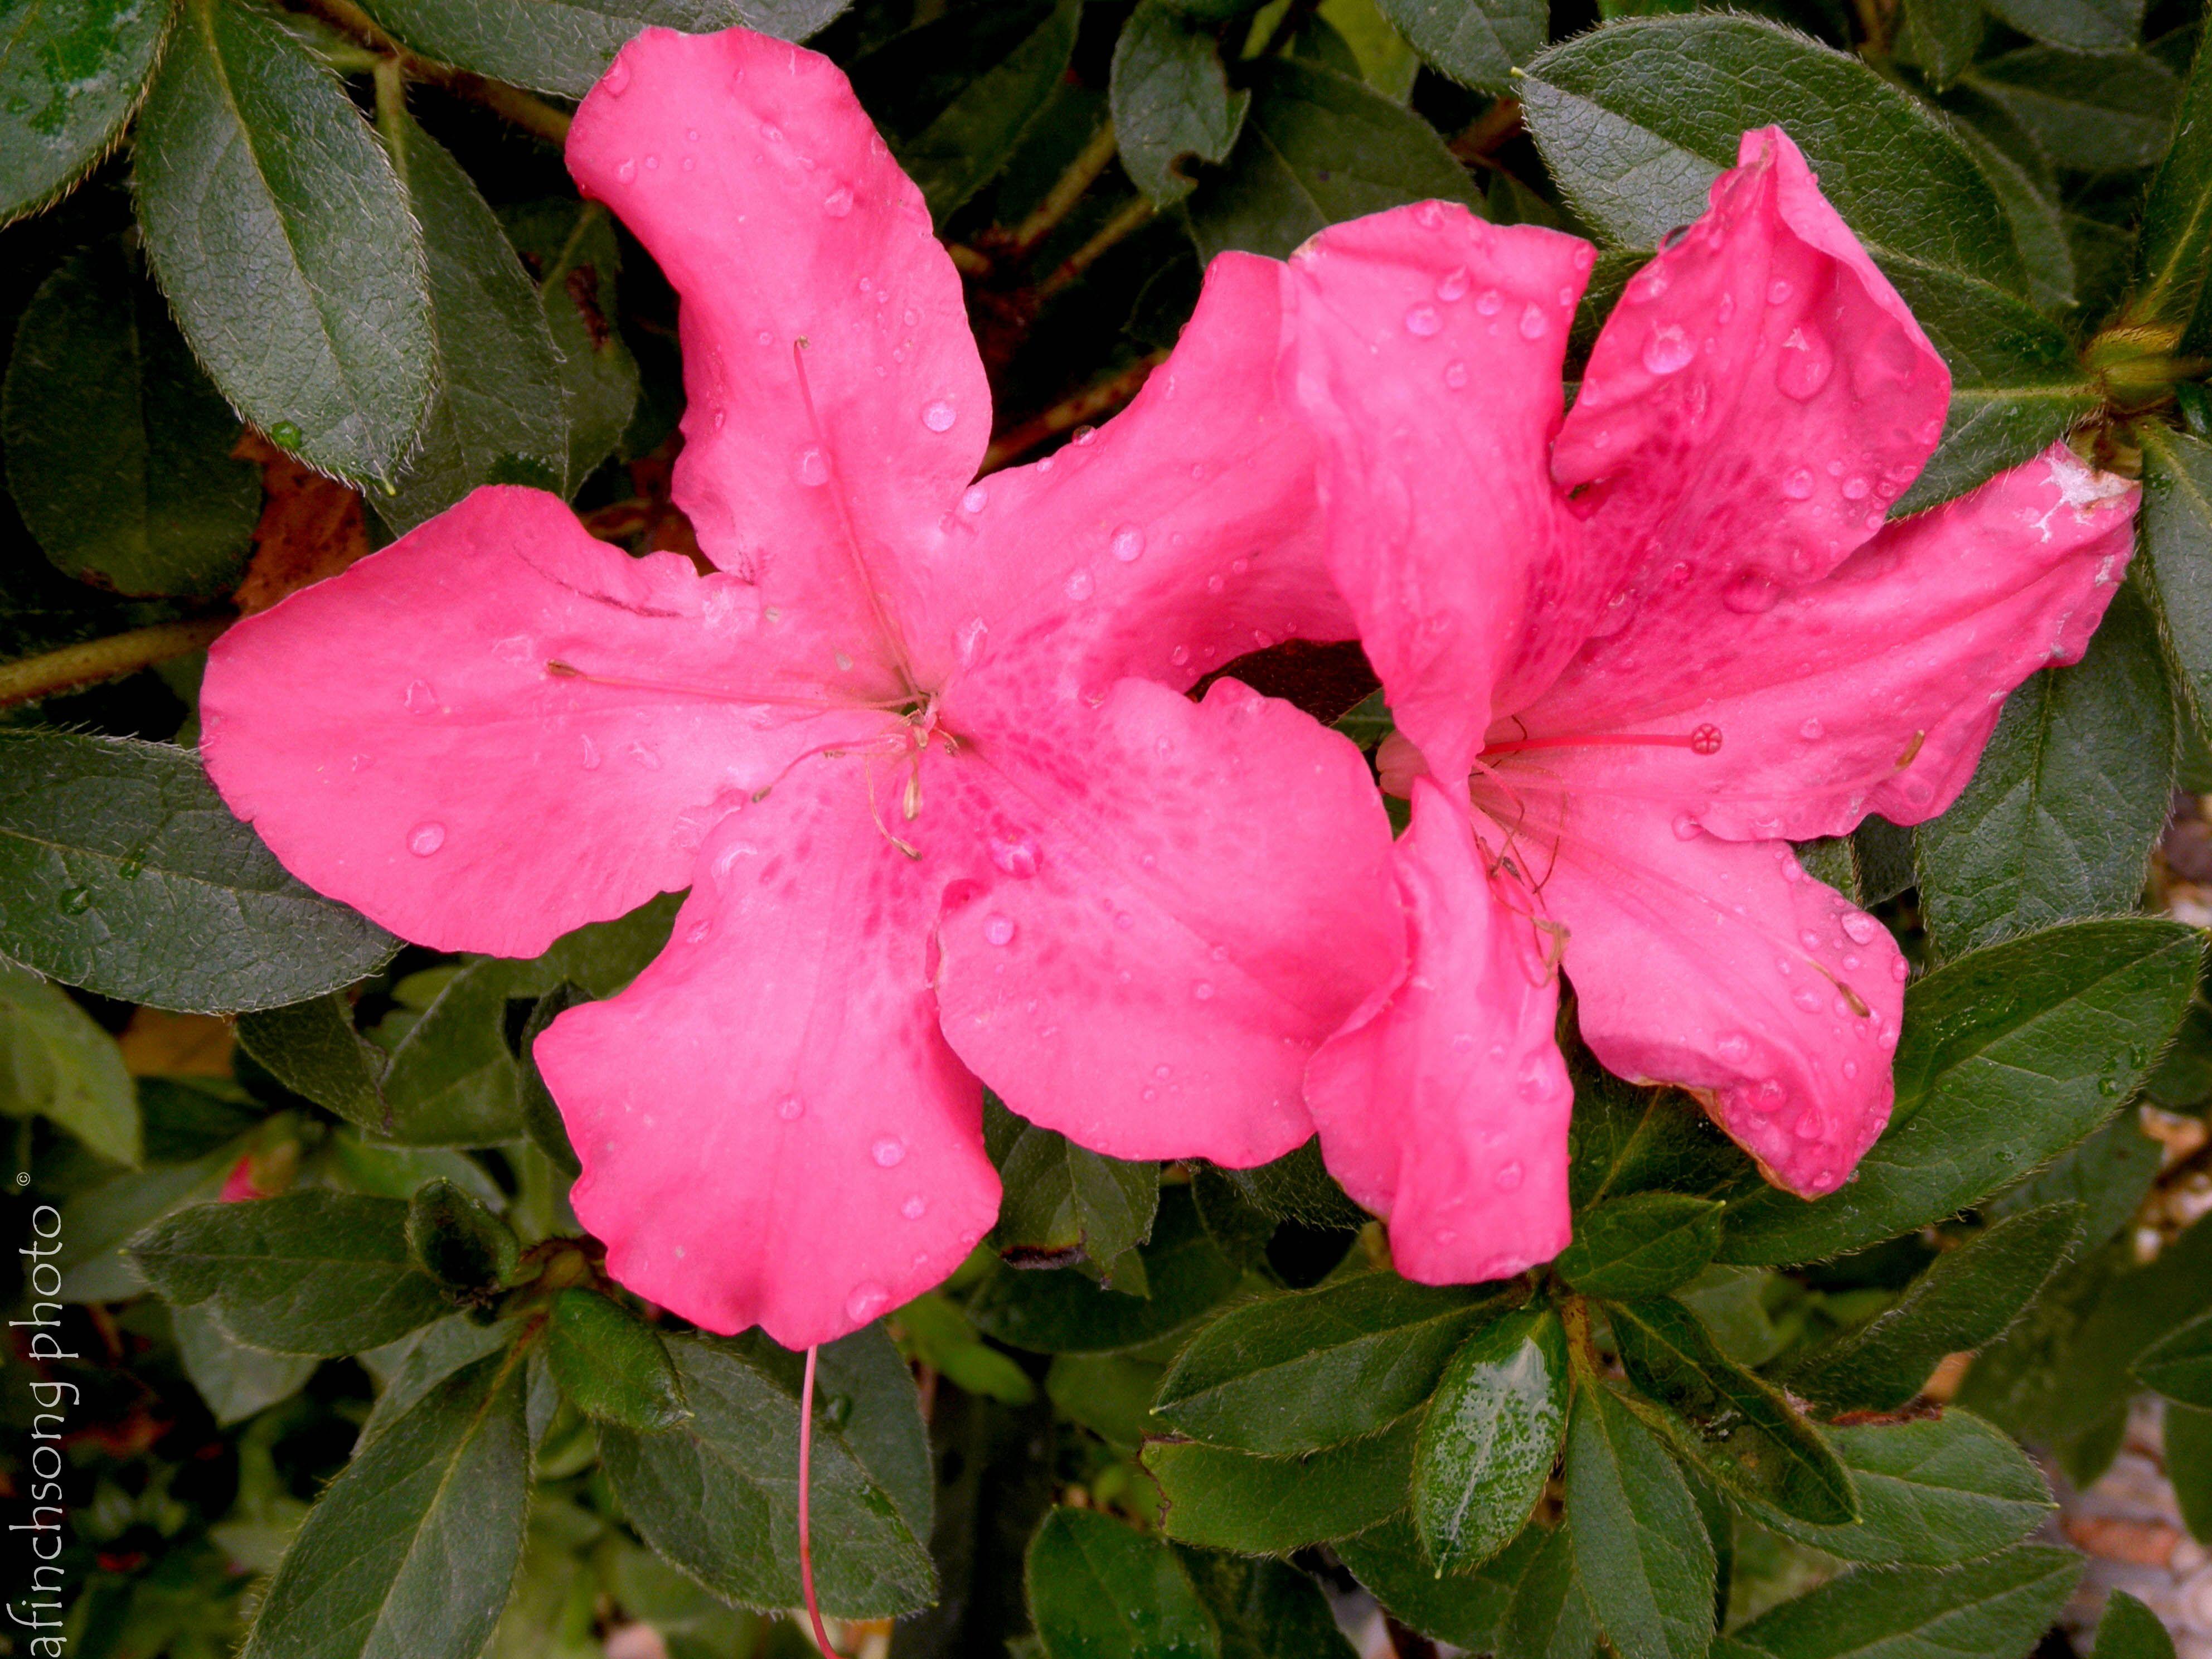 Azalea X Roblee Autumn Sangria Encore Azalea Flowering Evergreen Part To Full Sun 10 Year Size 4 5 Hx4 W Upright Rounded Bloom Neon Pink Single Spring Fa